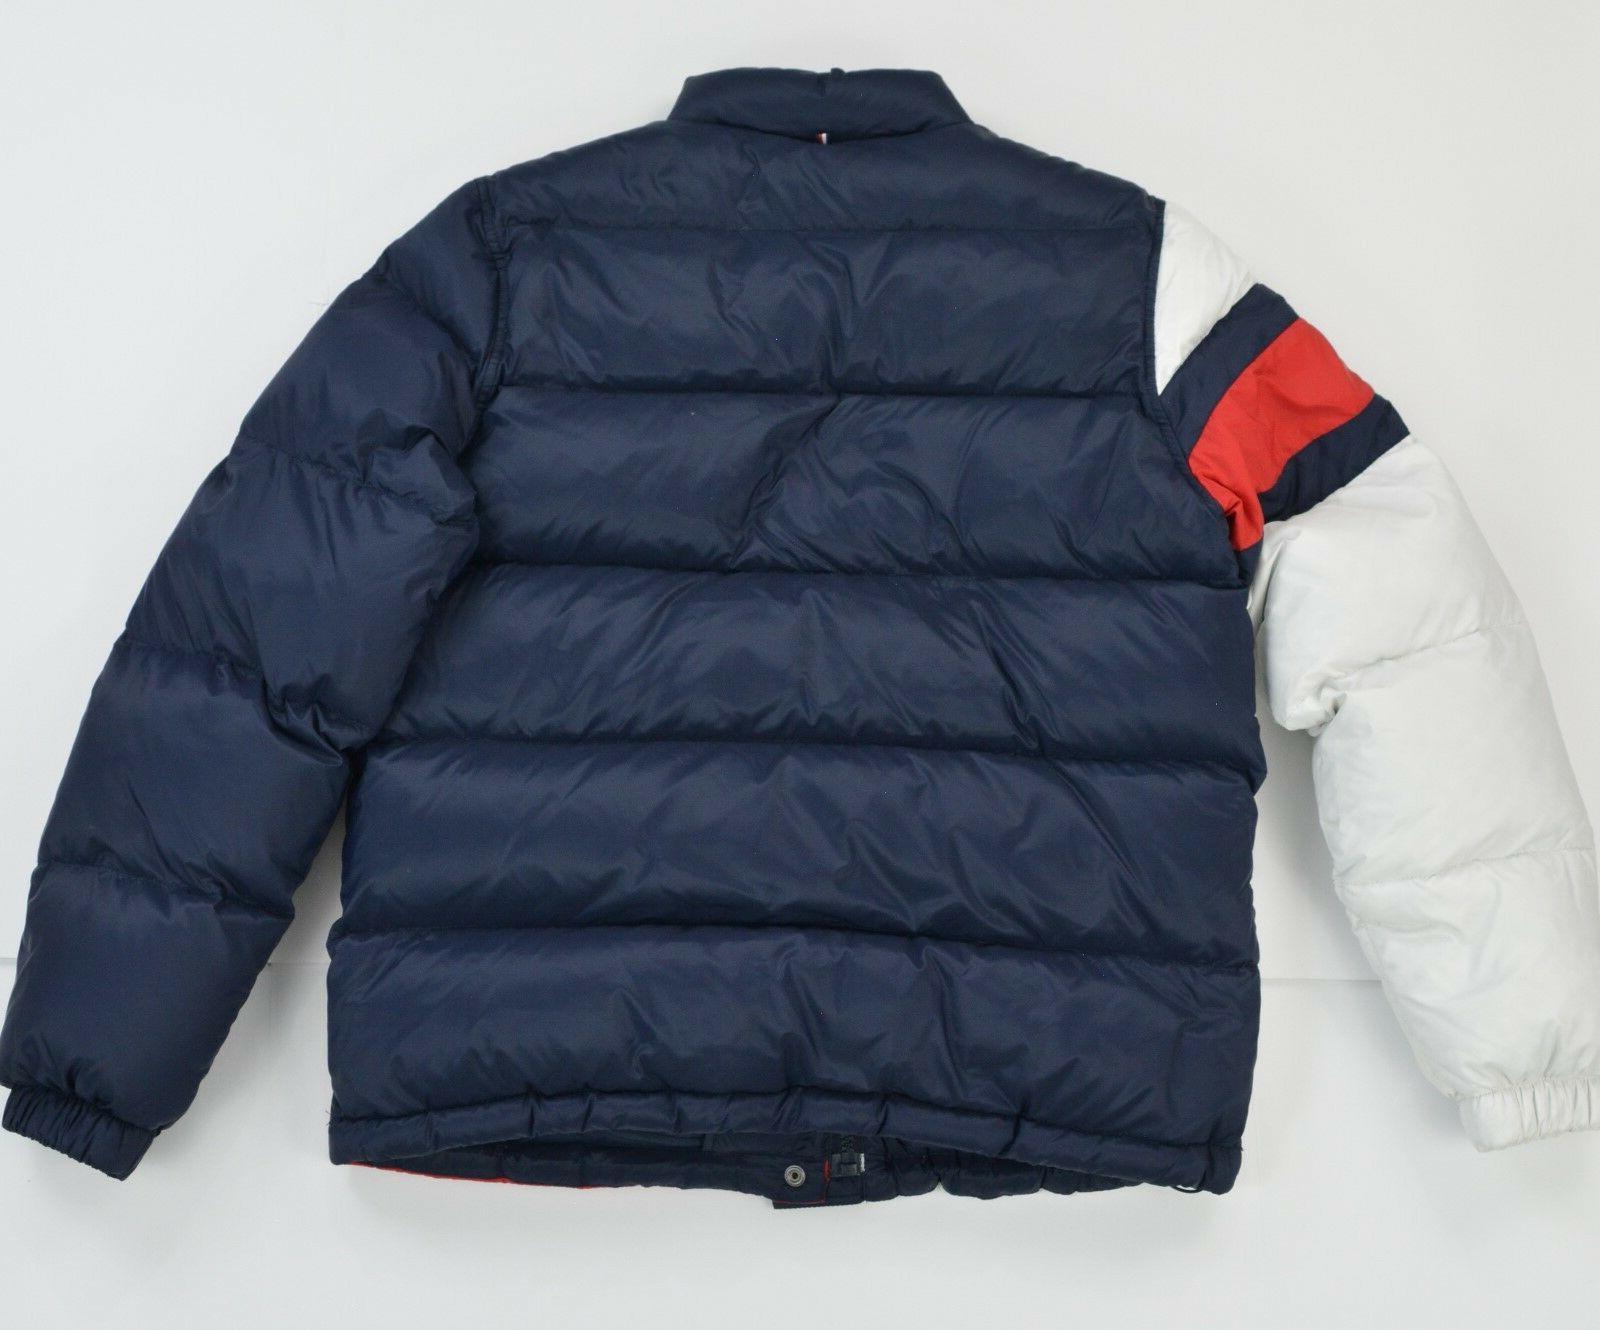 NWT Men/'s Tommy Hilfiger Puffer Jacket Outerwear ColdStop Reg $250  M L XL XXL